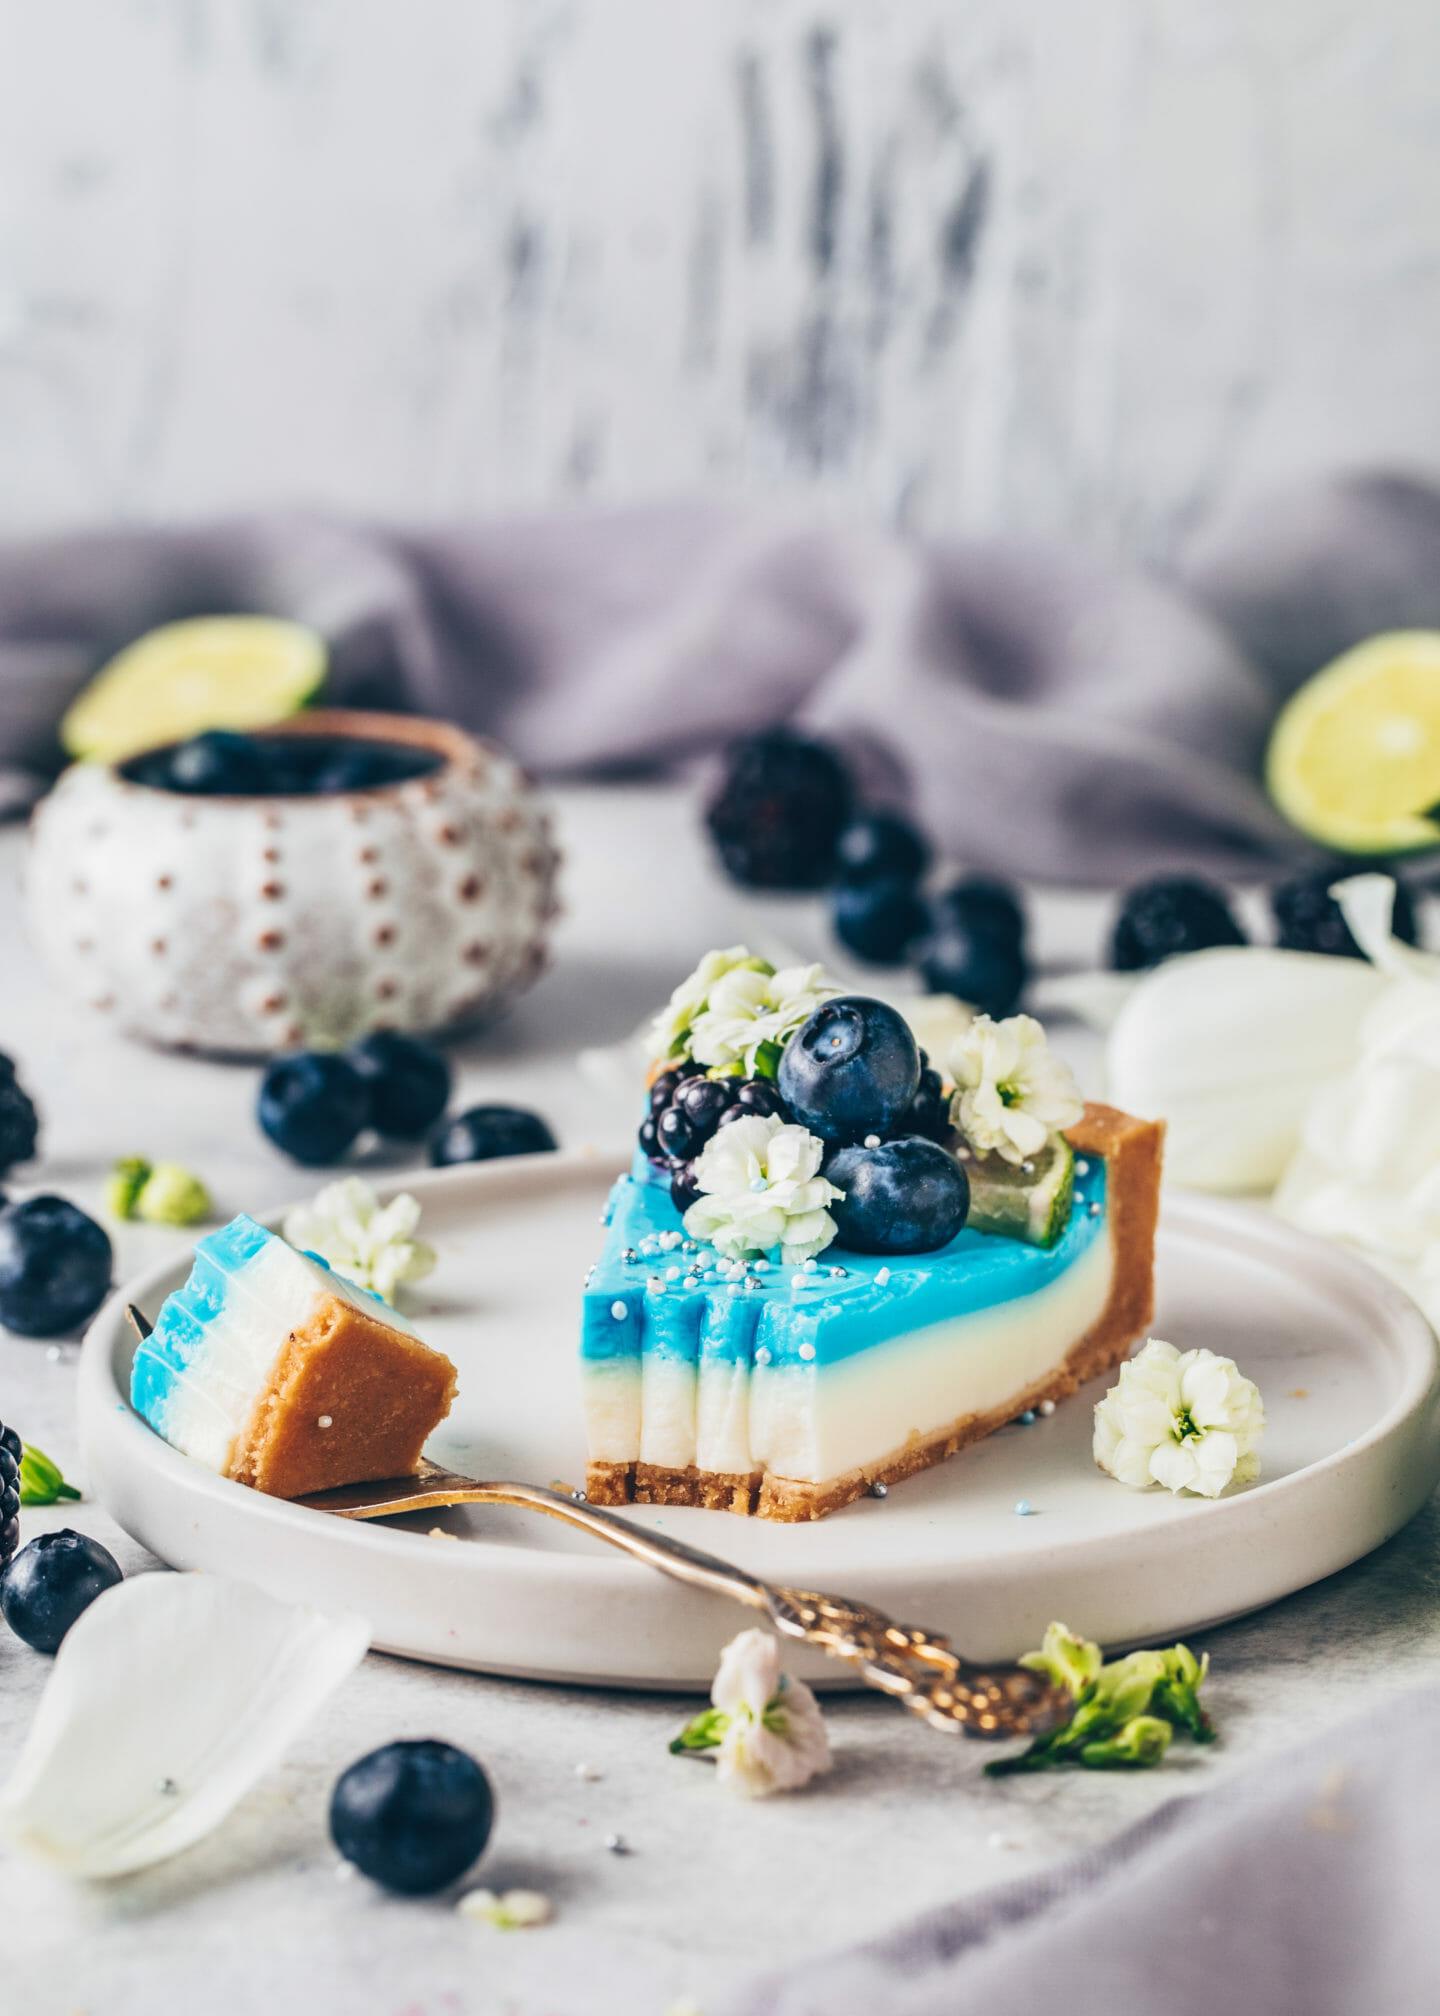 Blaue Spirulina Limetten-Tarte mit Blaubeeren und Brombeeren (Food Fotografie)